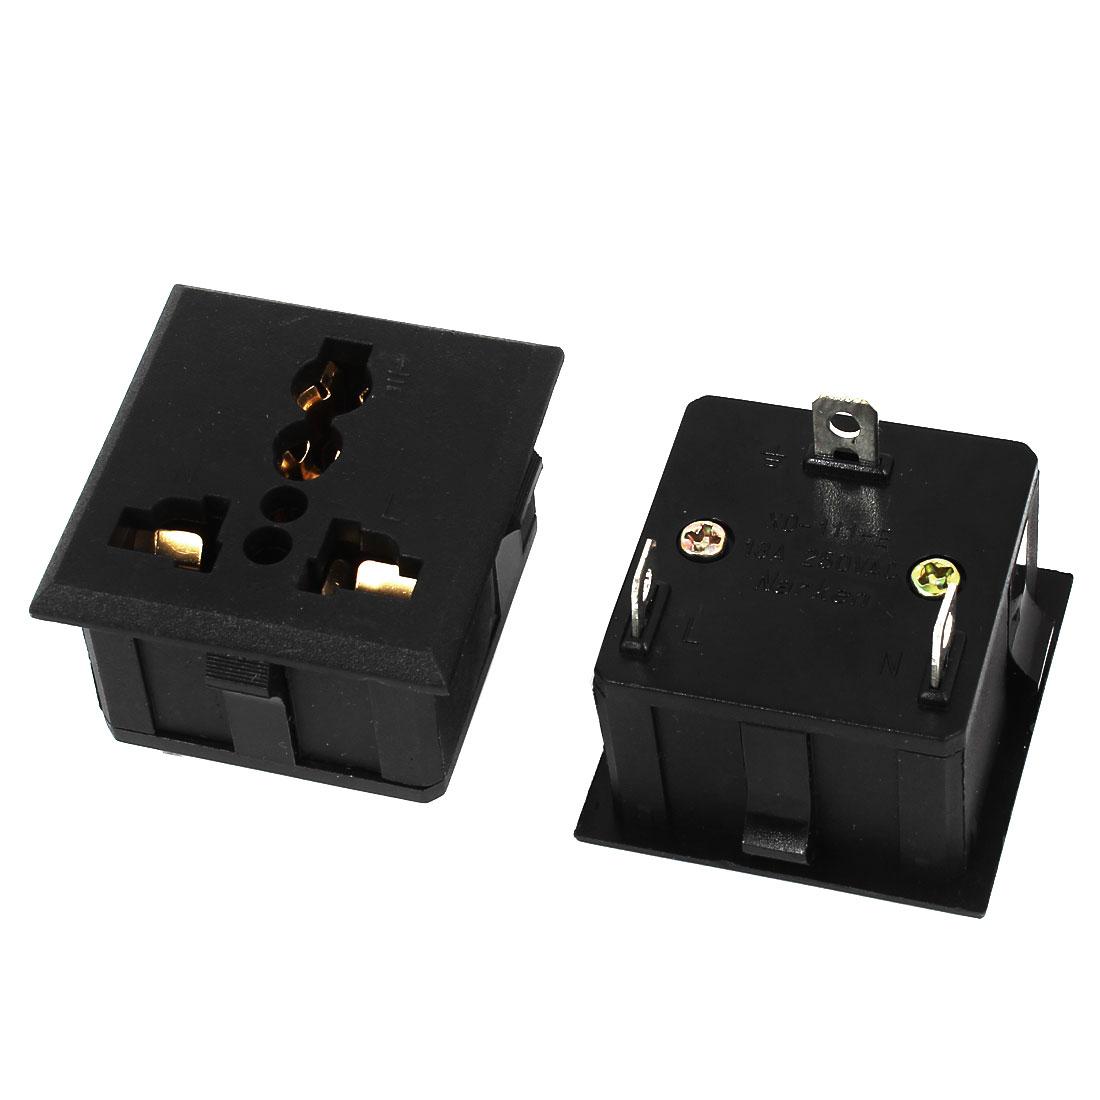 2 Pcs AC 250V 13A 3 Pin to AU EU UK US Socket Pannel Mounting Travel Converter Power Adapter